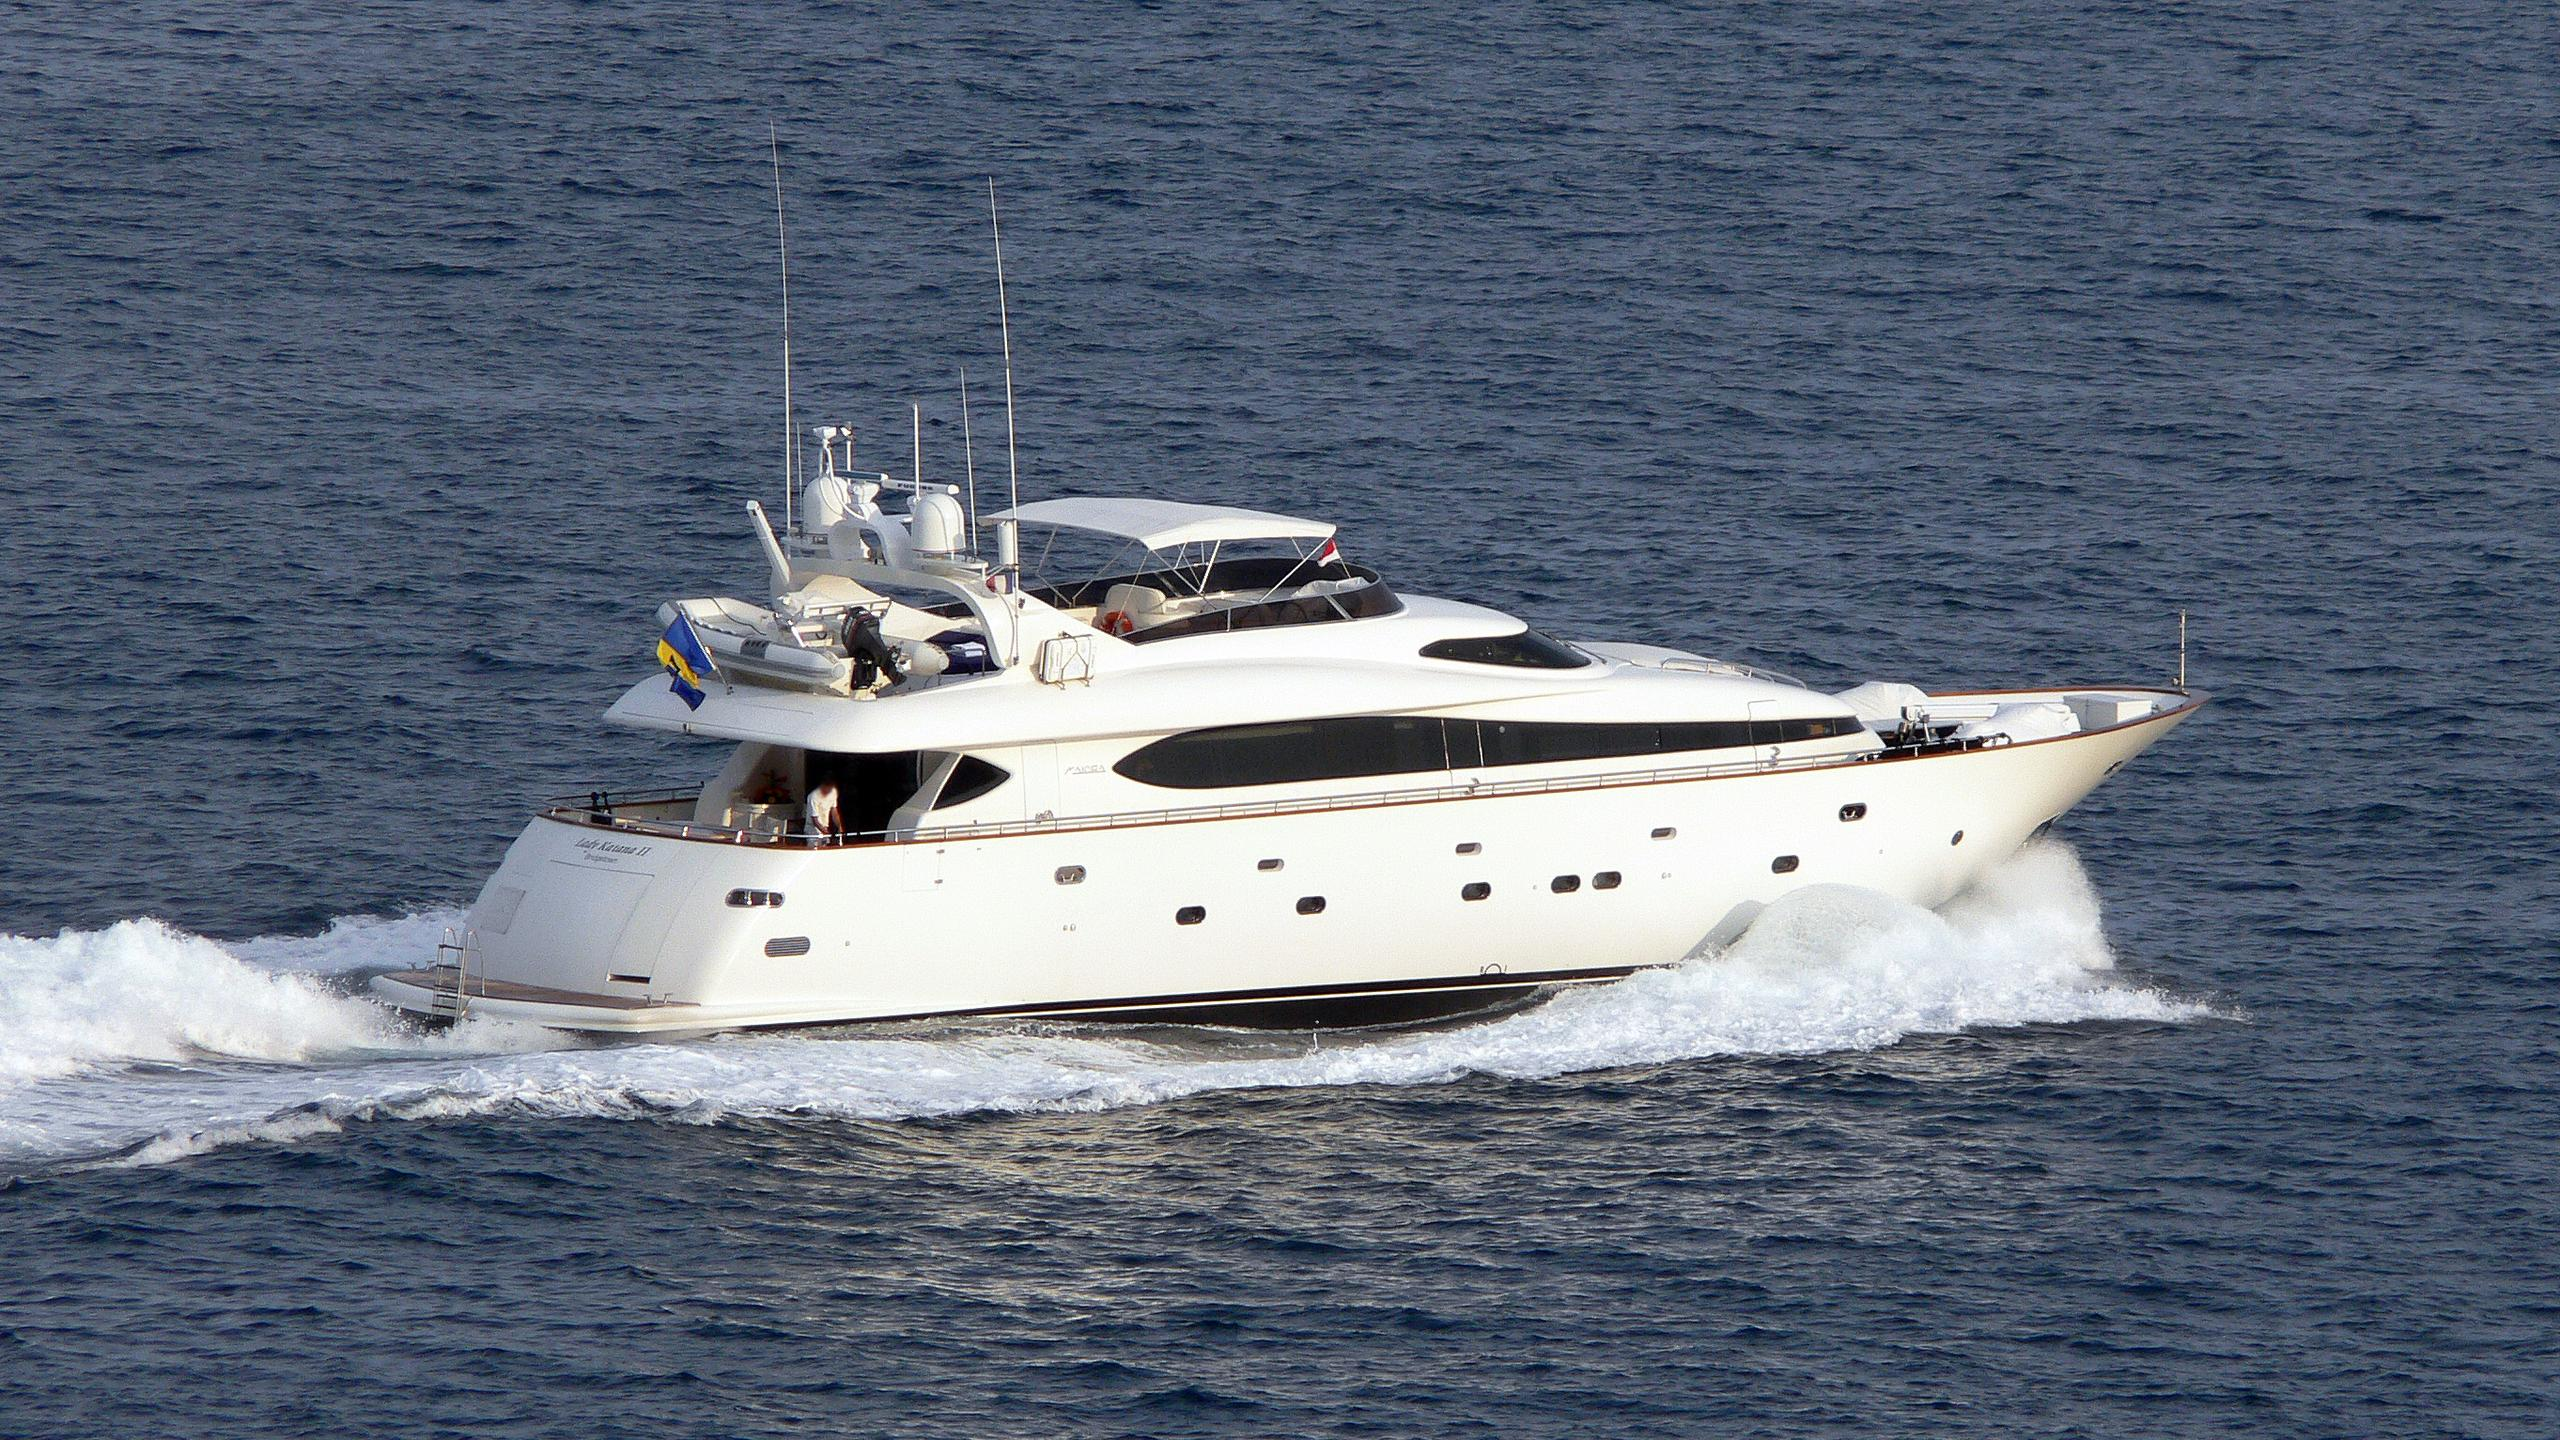 lady-katana-ii-motor-yacht-maiora-29dp-extended-30m-1997-half-profile